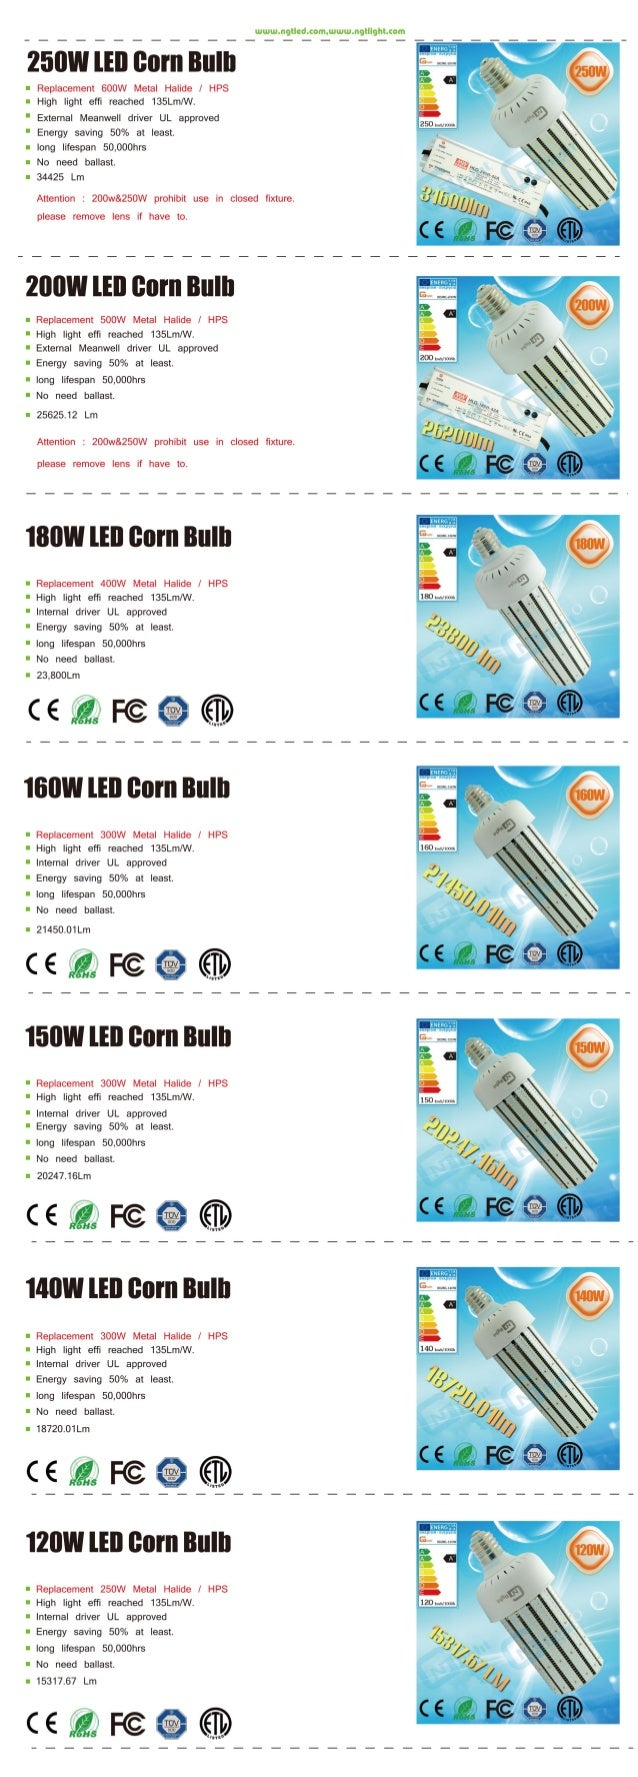 uawui. ngtlcd. com. uiuaui. n9l| lght. <om  250W [Ell Born Bull!  I Replacement 600W Metal Halide /  HPS  I High light eff...